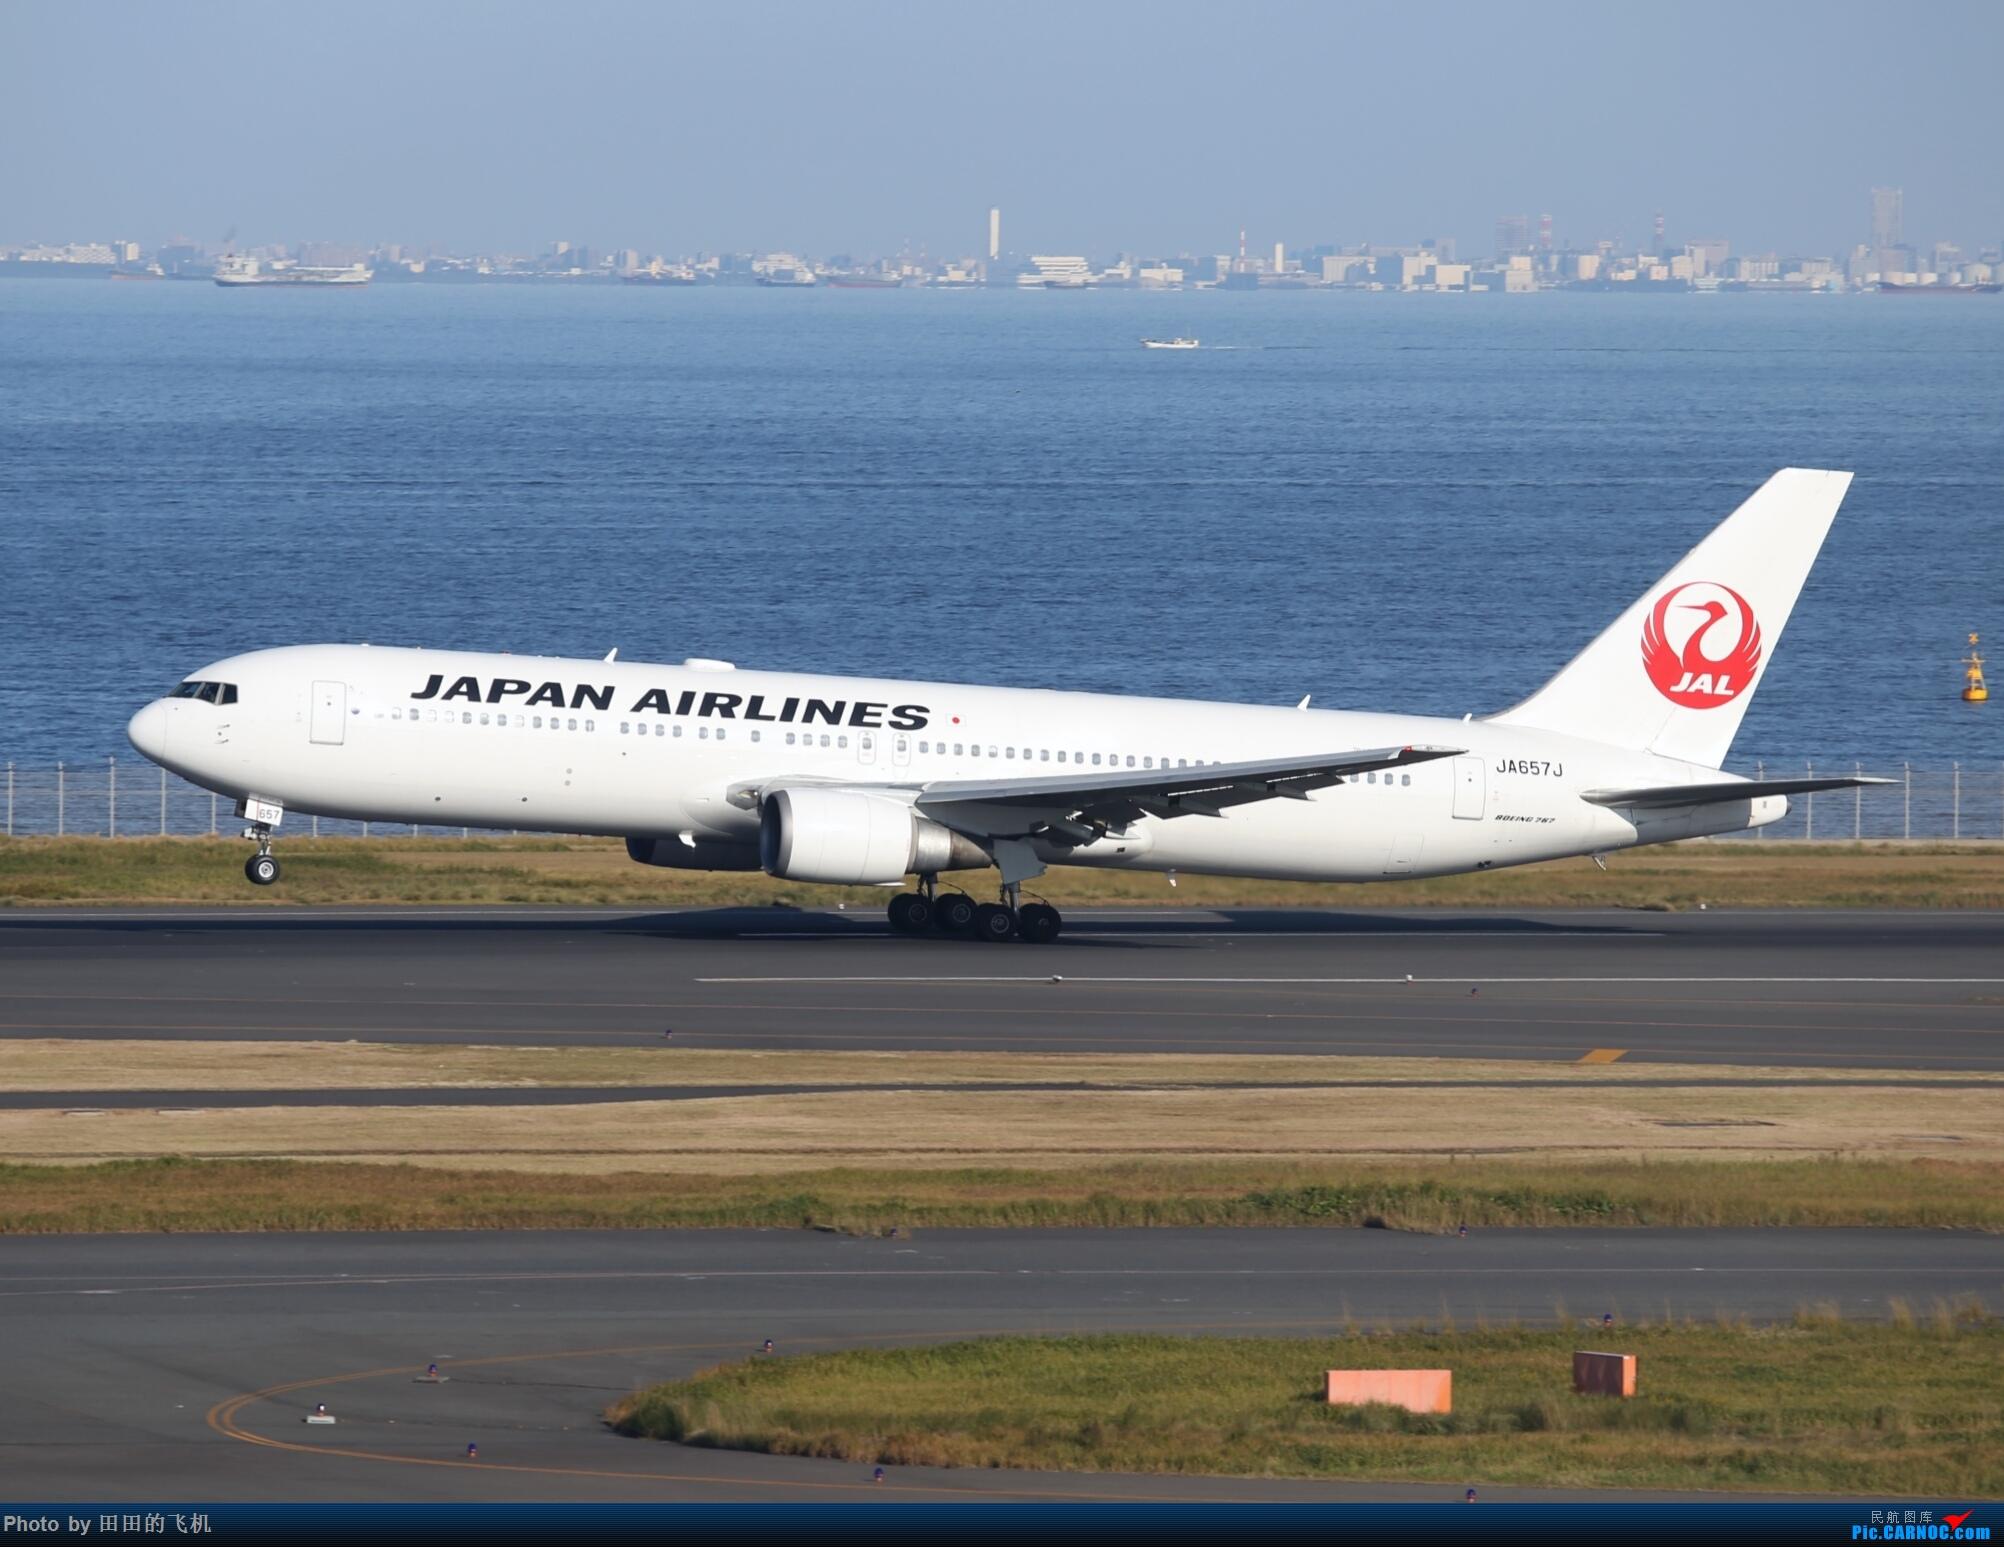 Re:[原创]整理一下去年东京羽田机场拍的飞机 767 JA657J 东京羽田机场